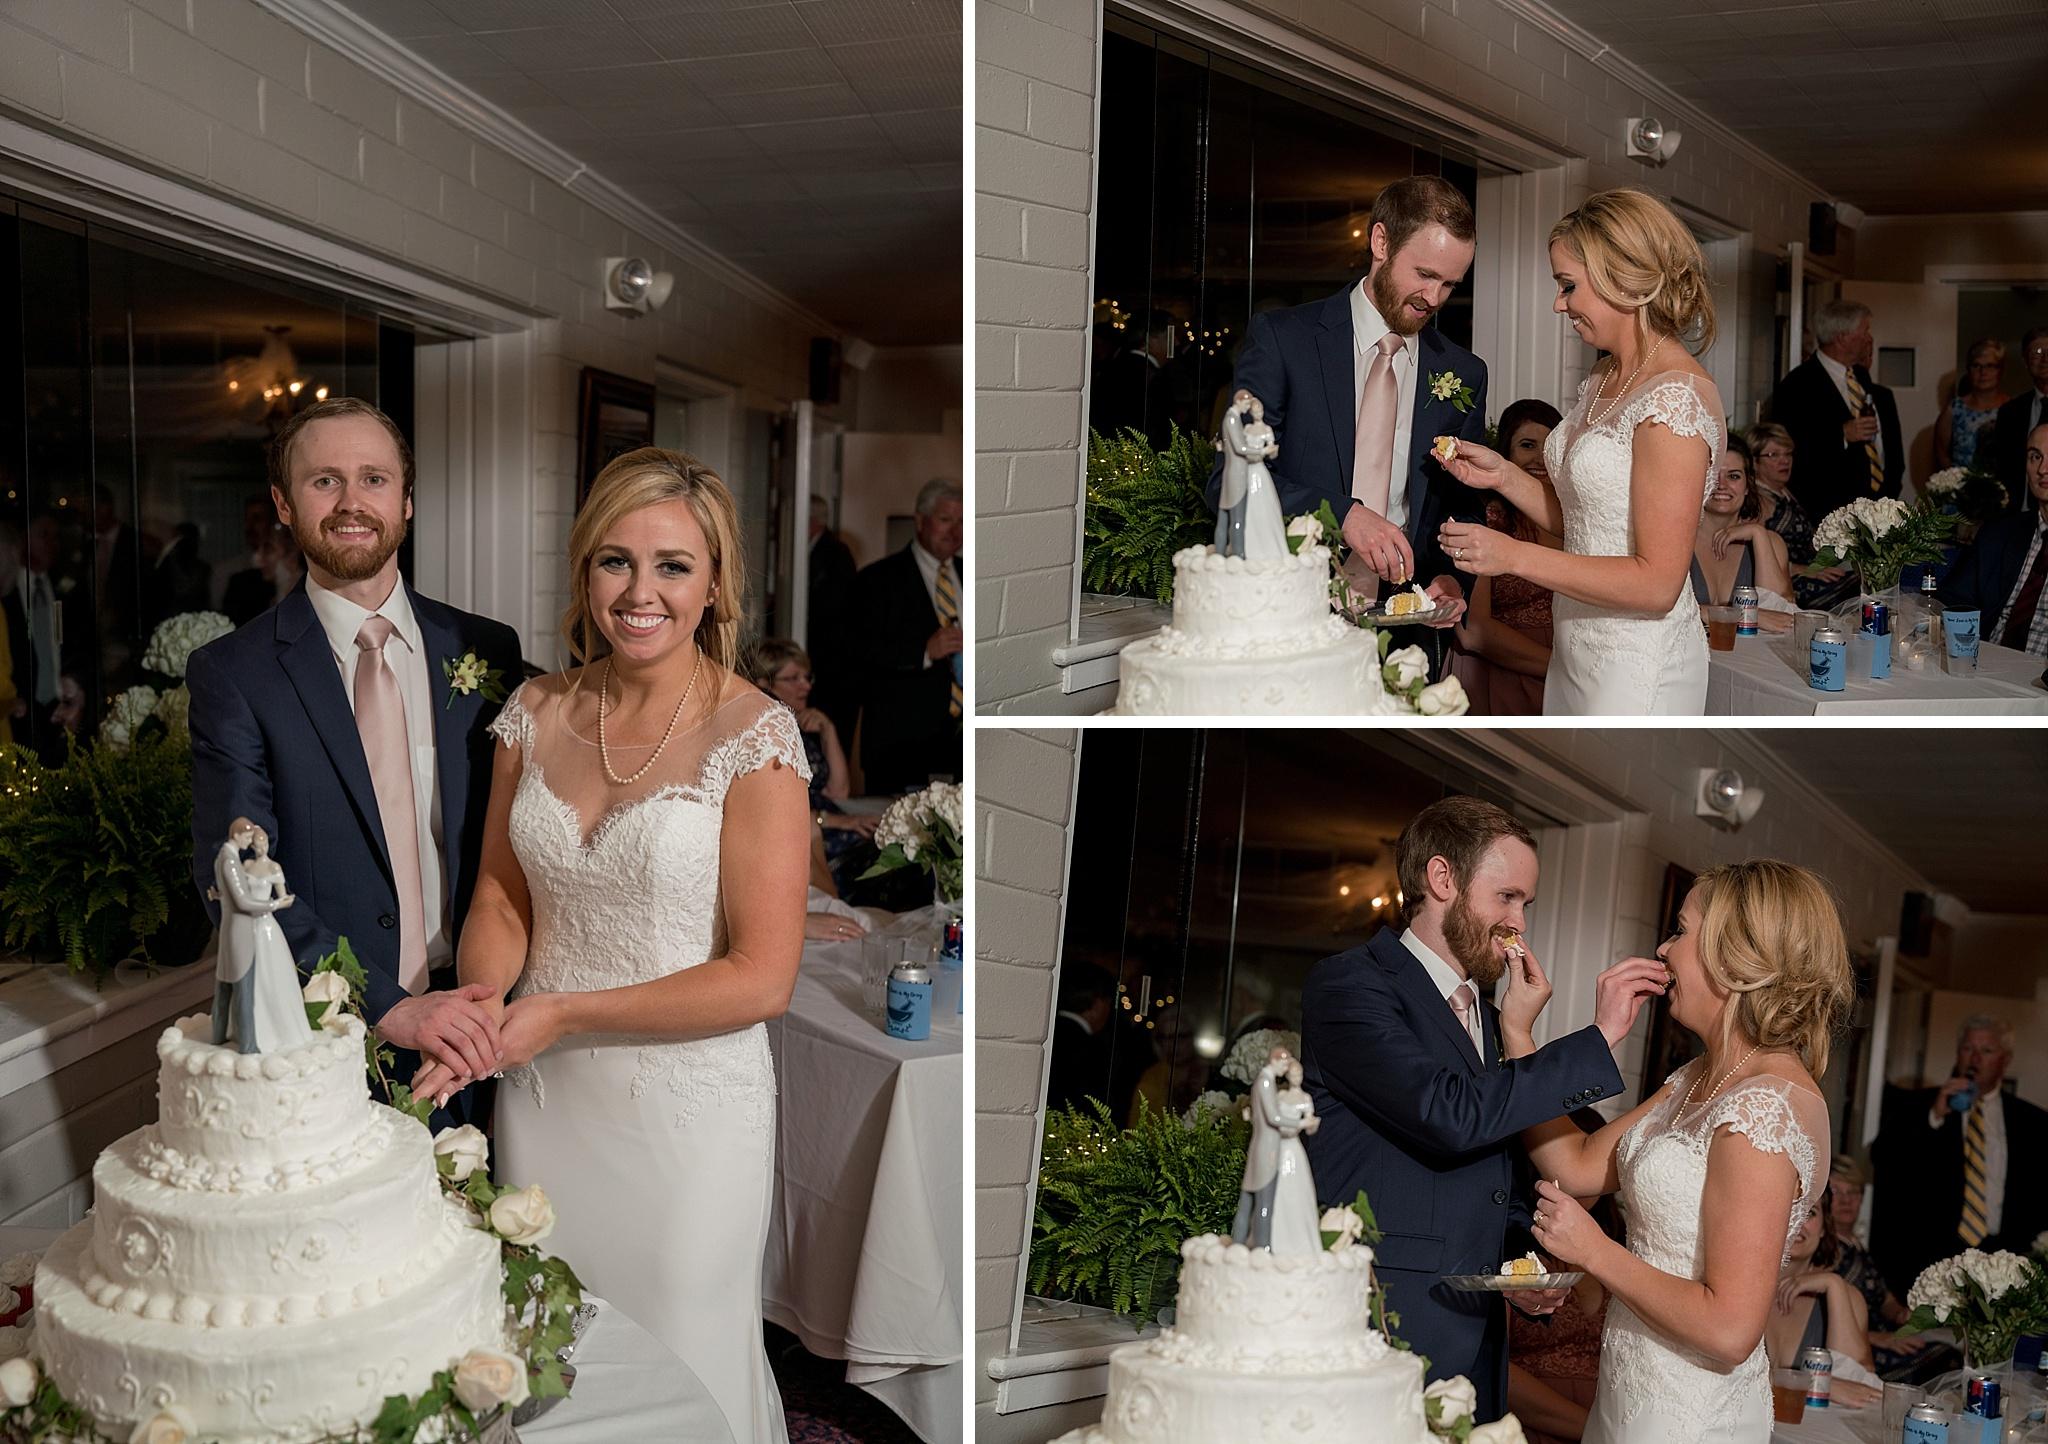 Williamston-NC-Wedding-Photographer-051.jpg